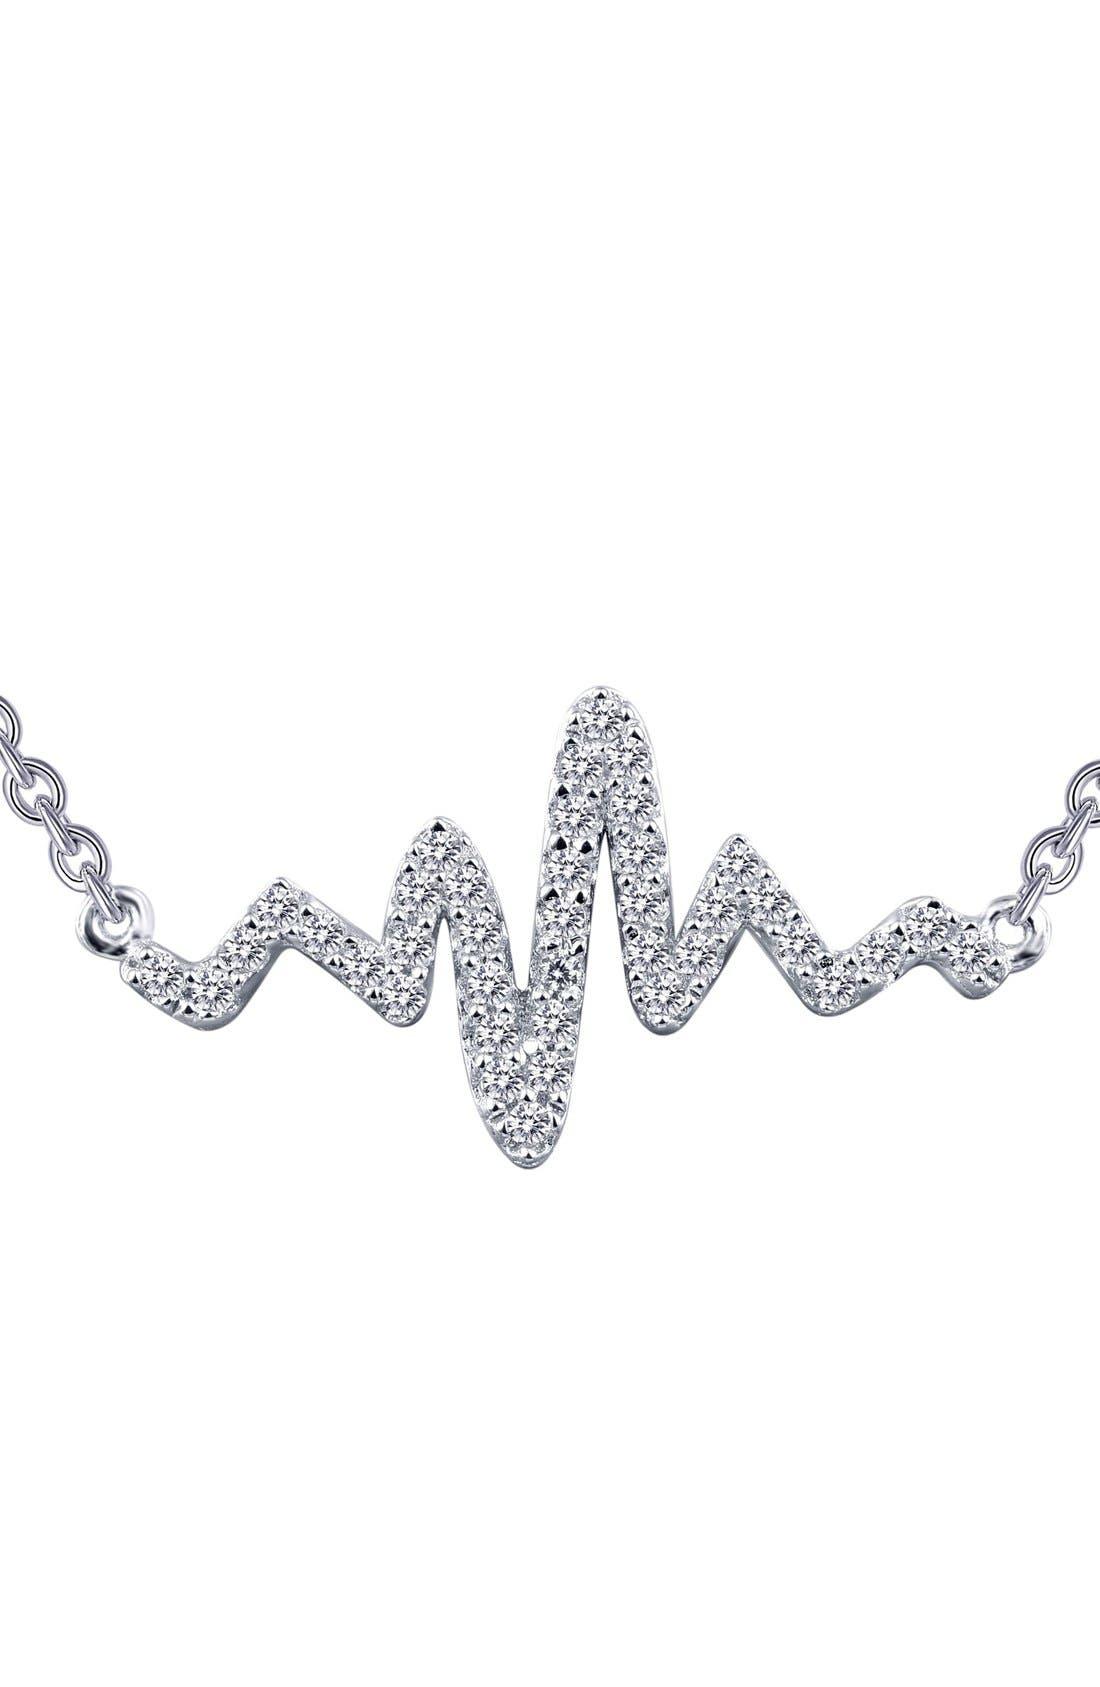 Alternate Image 1 Selected - Lafonn 'Lassaire' Heartbeat Pendant Necklace